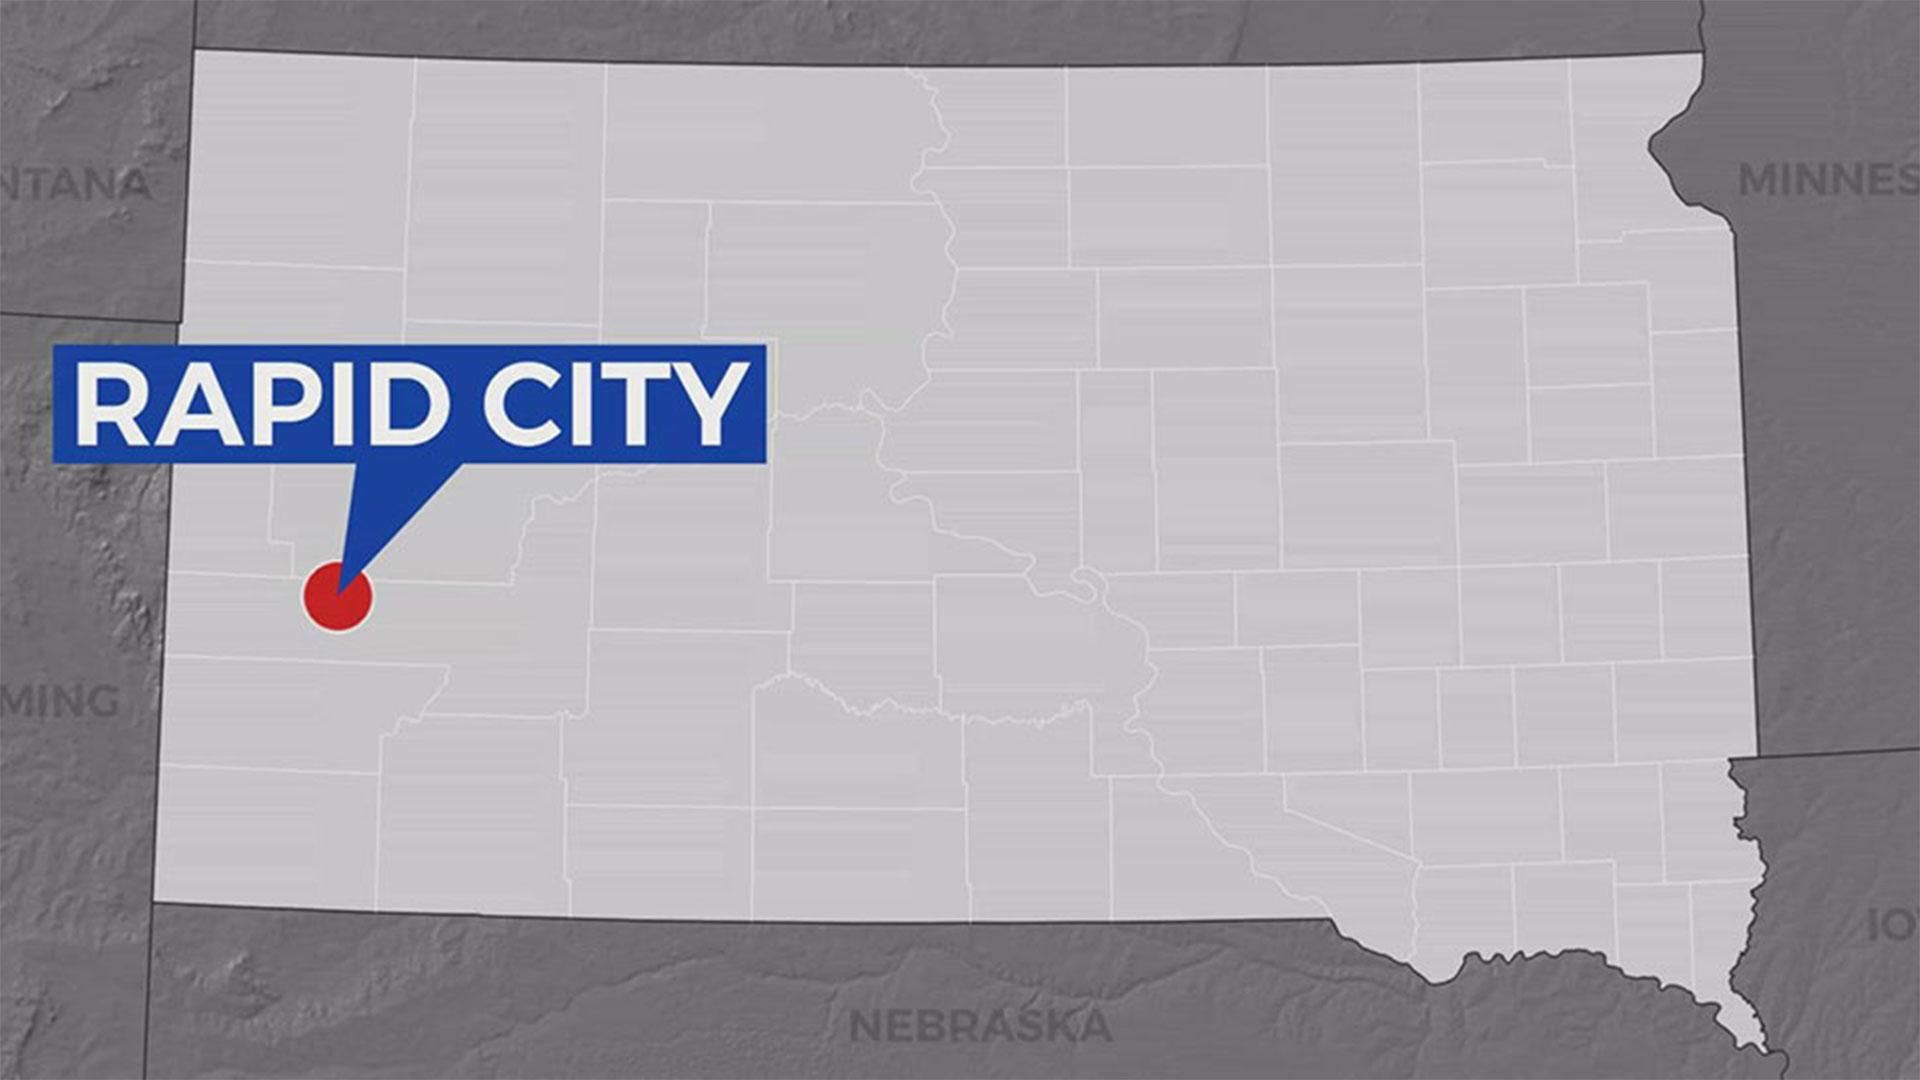 KELO Rapid City locator map